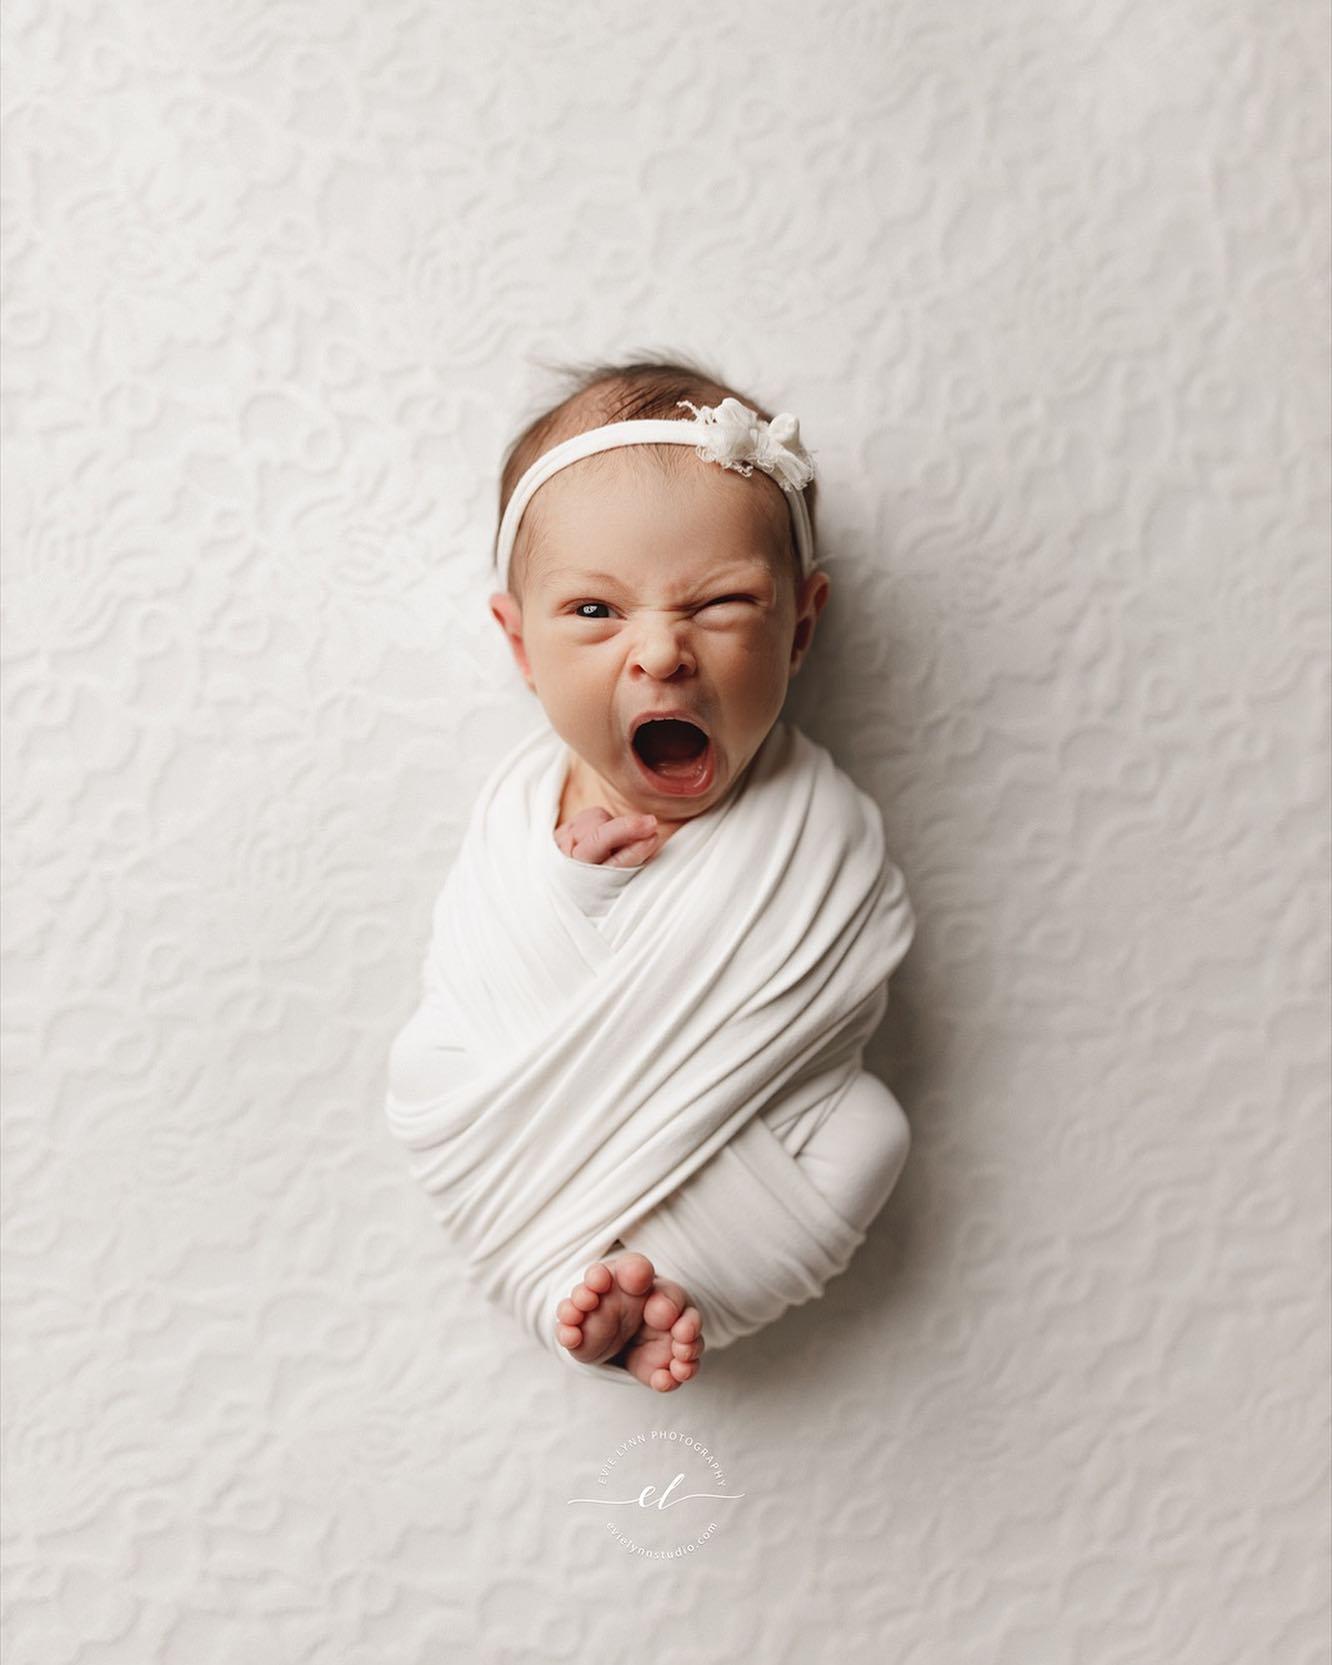 Meet Nashville Newborn Photographer, Evie Lynn Photography | Nashville Baby Guide